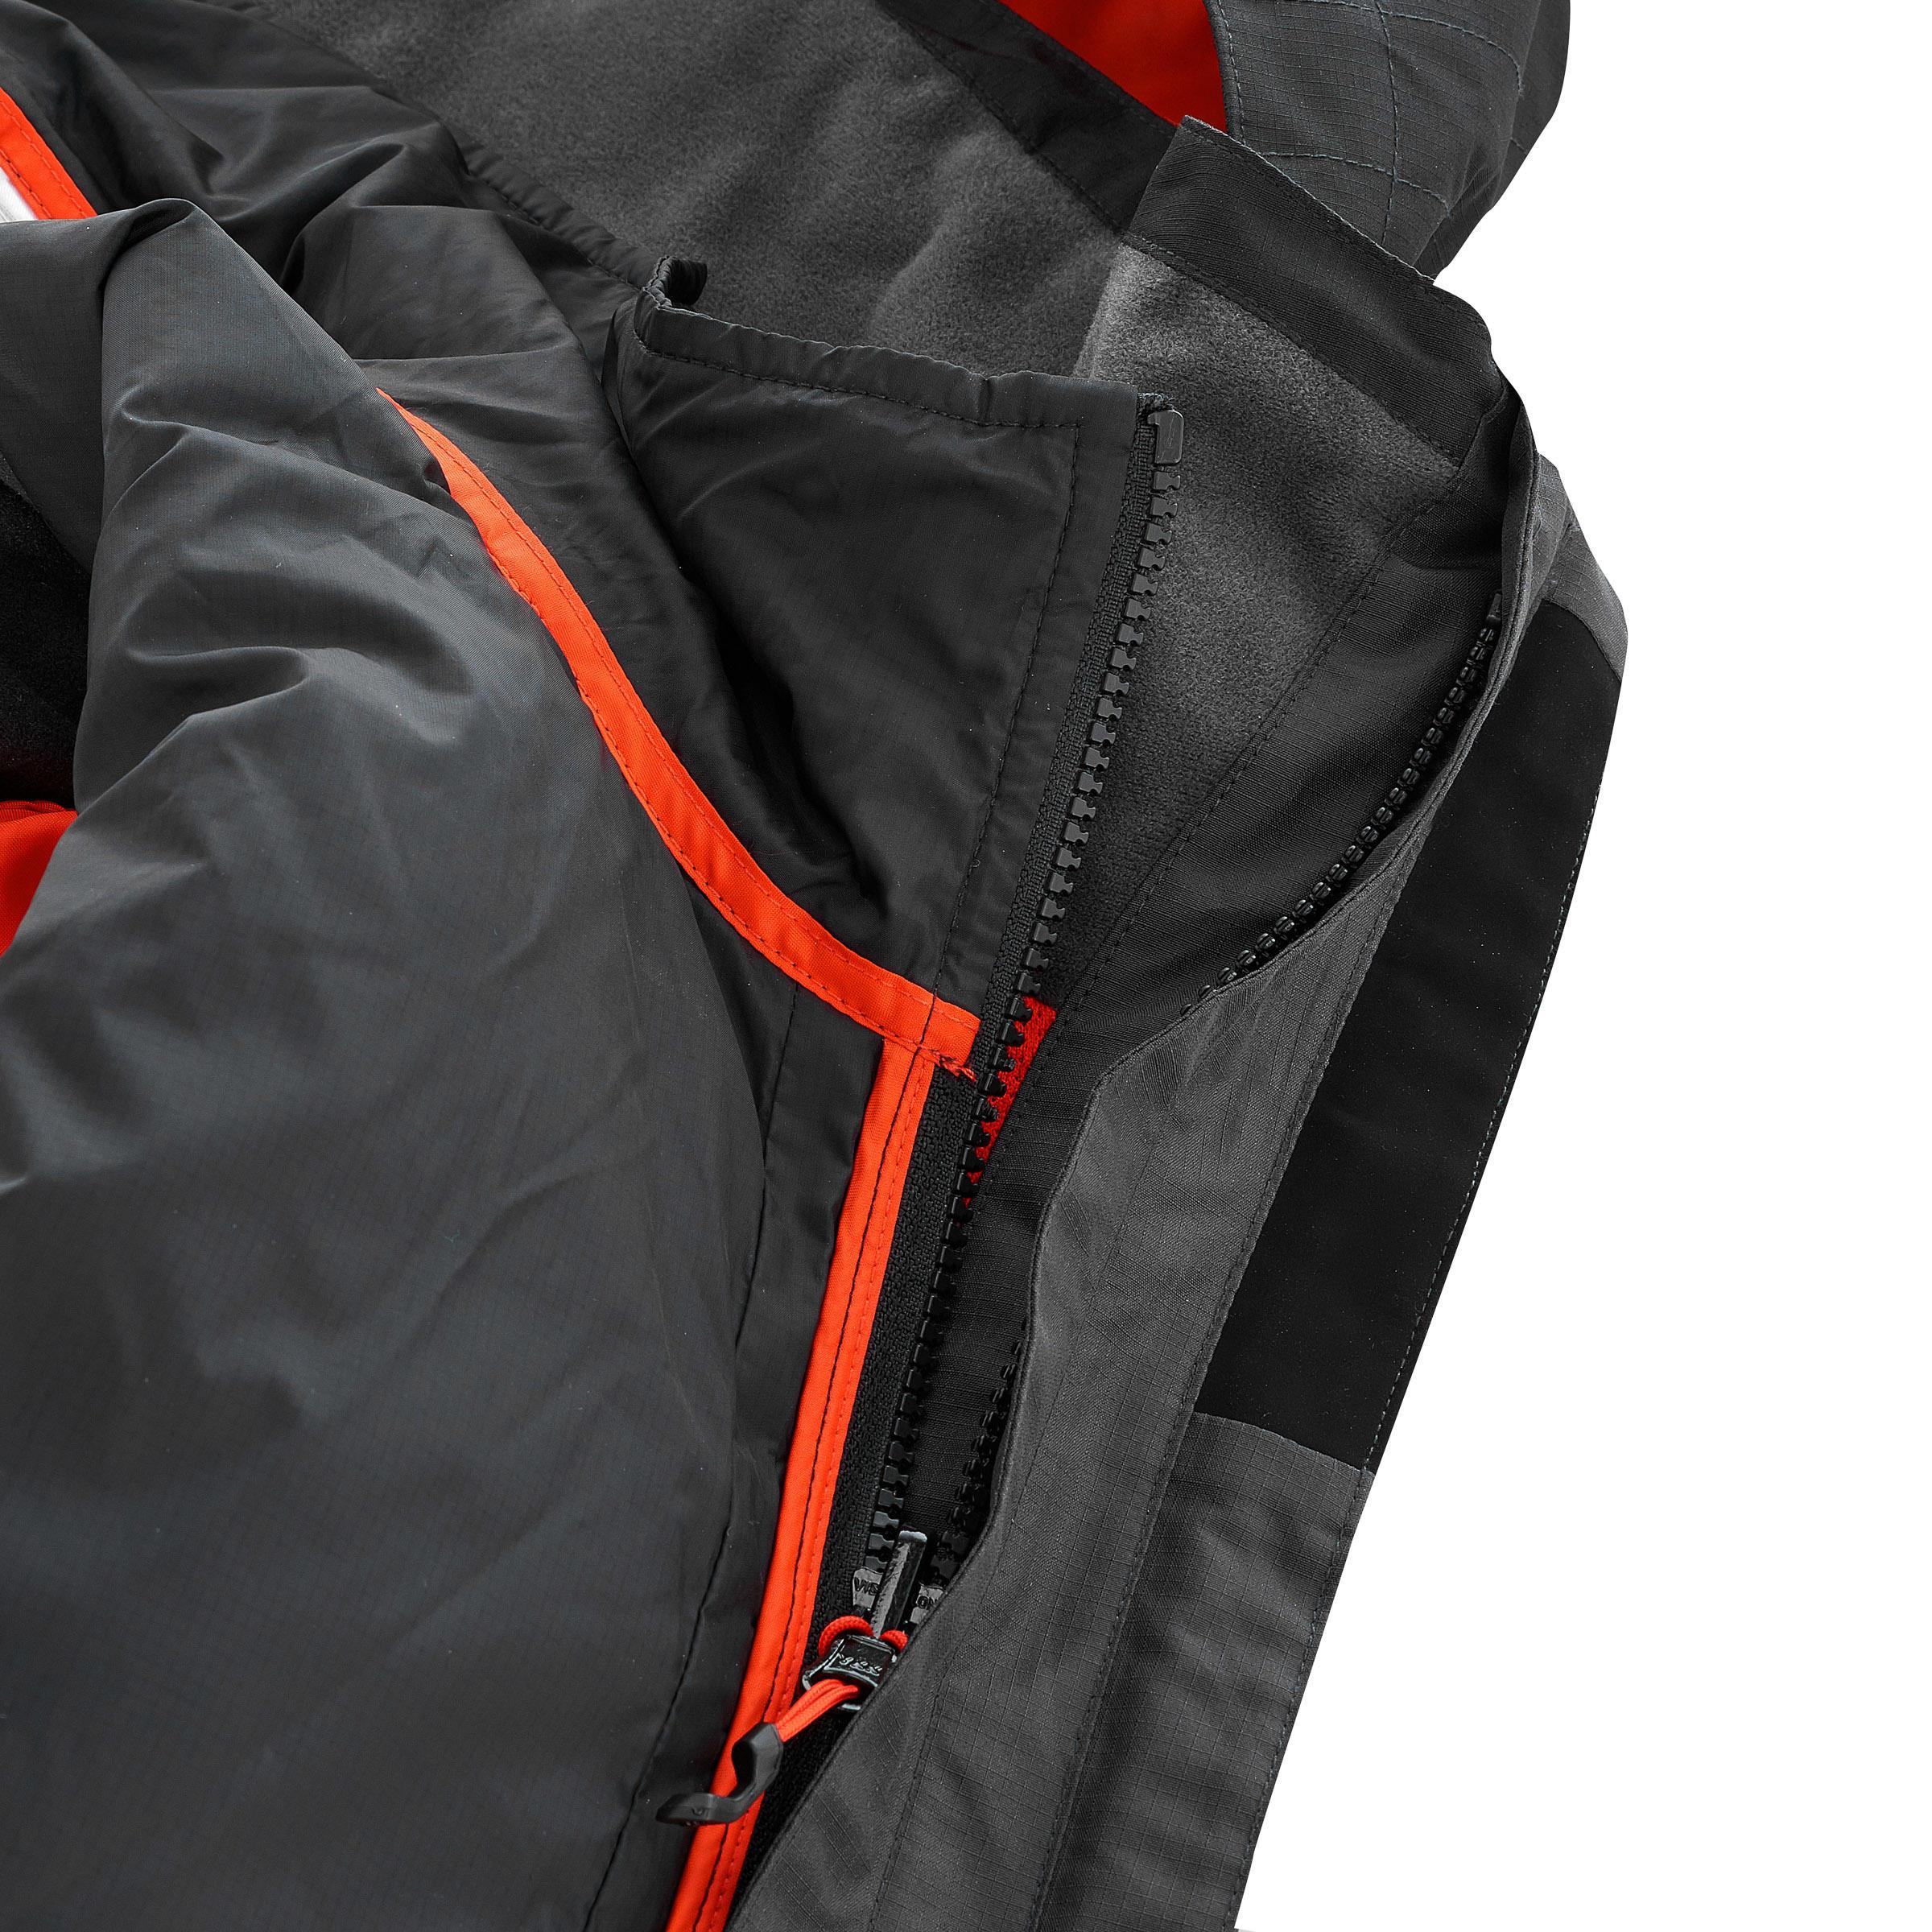 Men's 3 in 1 Waterproof Travel Jacket Travel 500 -black